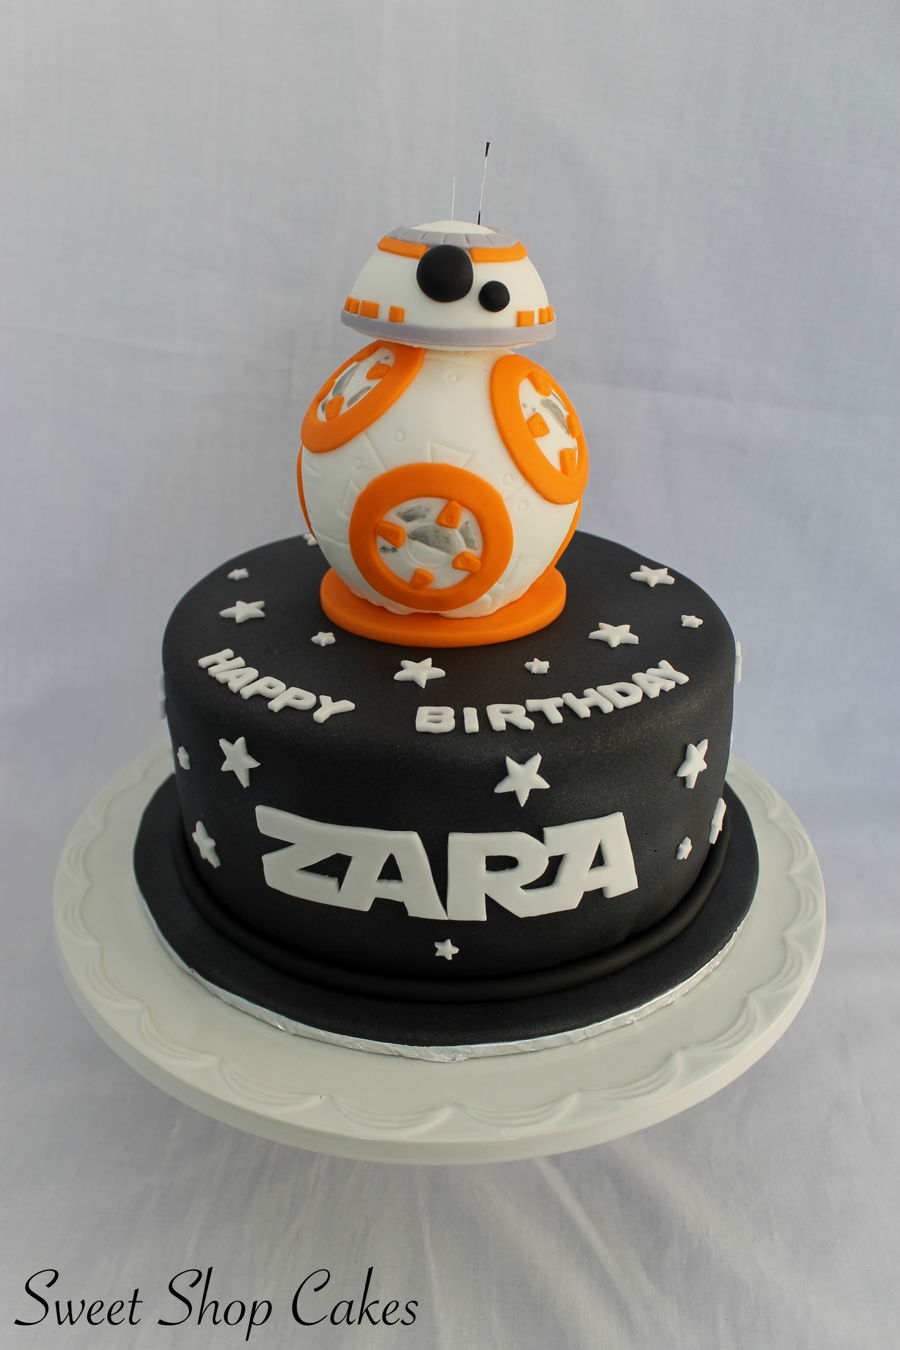 900_star-wars-bb-8-birthday-cake-937512Ct9FY.jpg